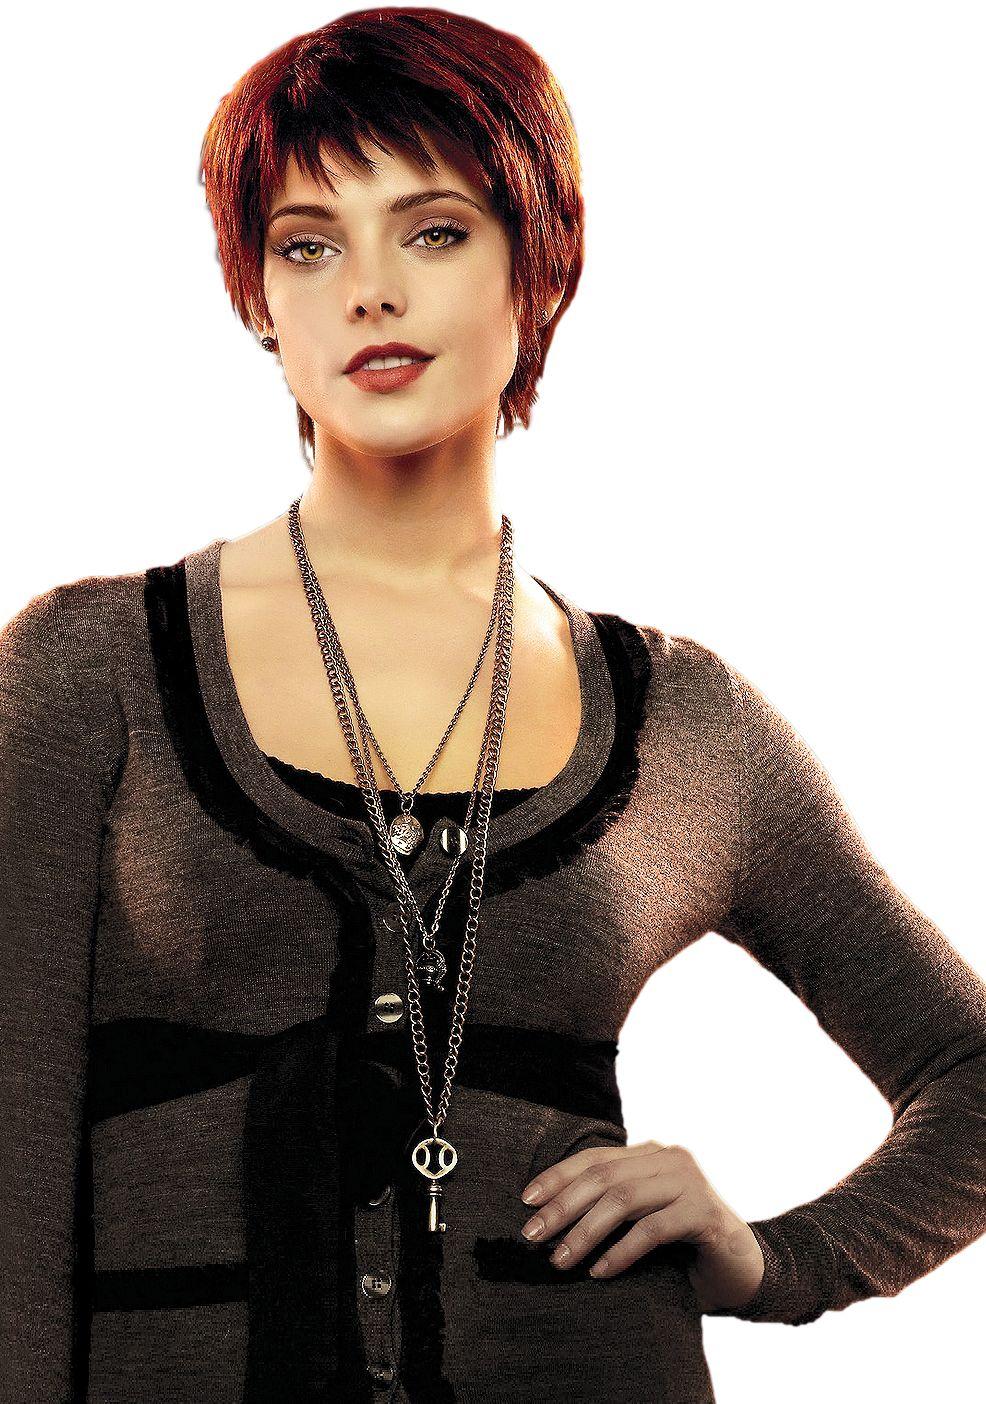 gallery alice cullen for redheads stars women pinterest